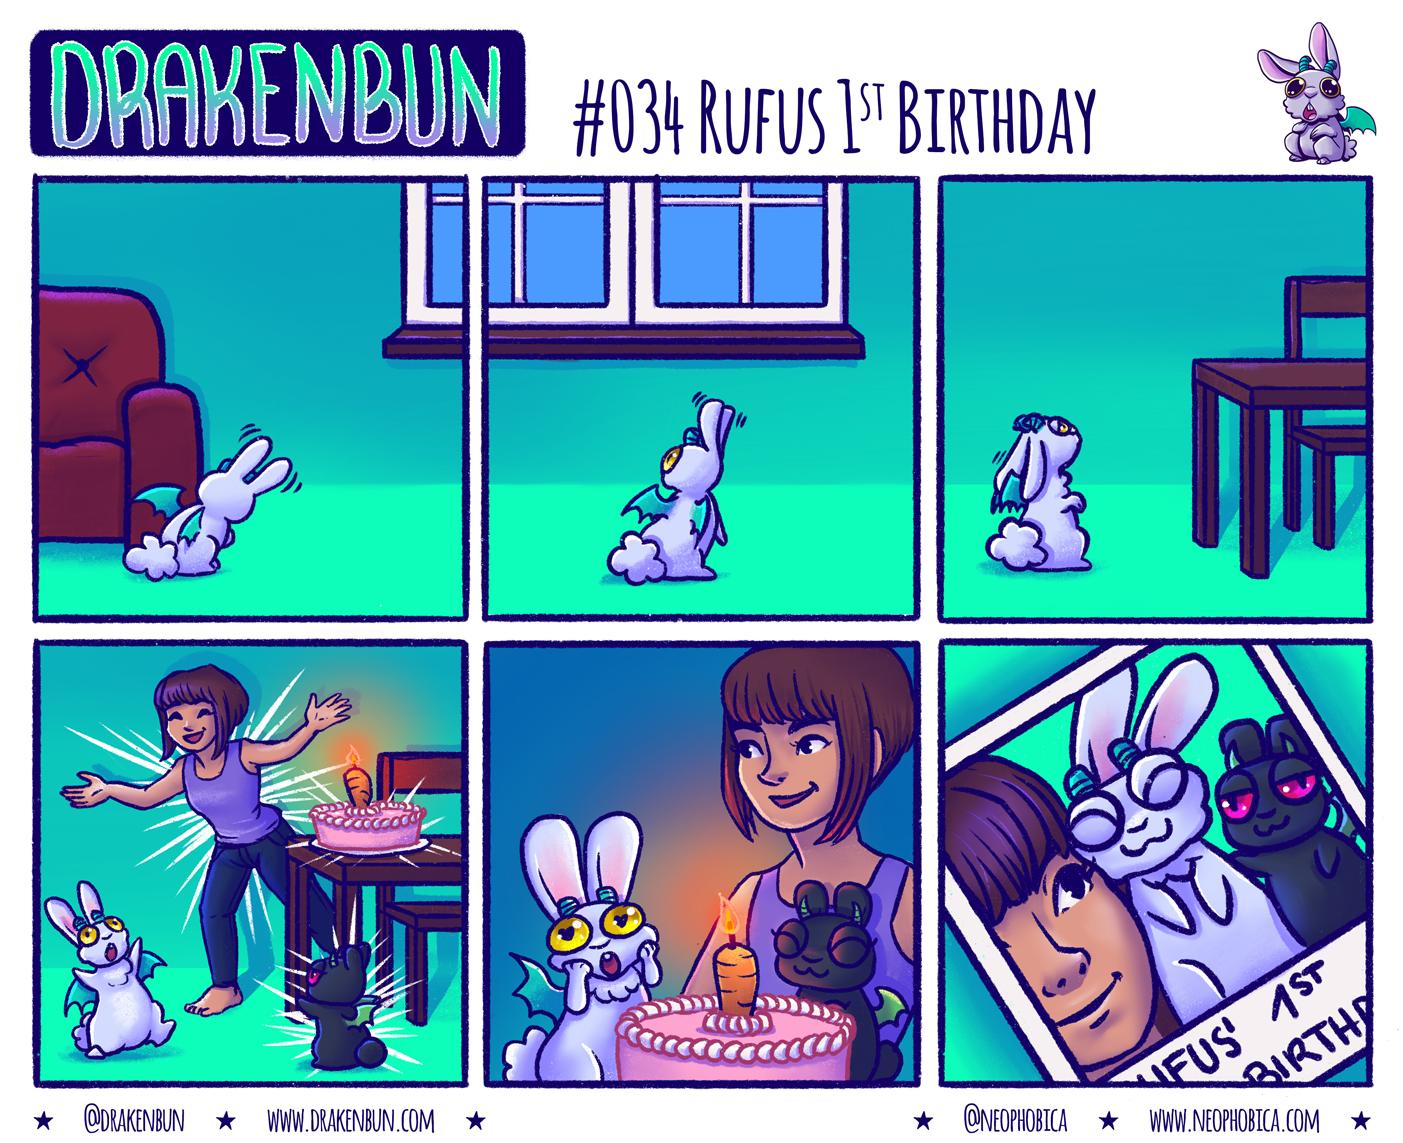 #034 Rufus 1st Birthday